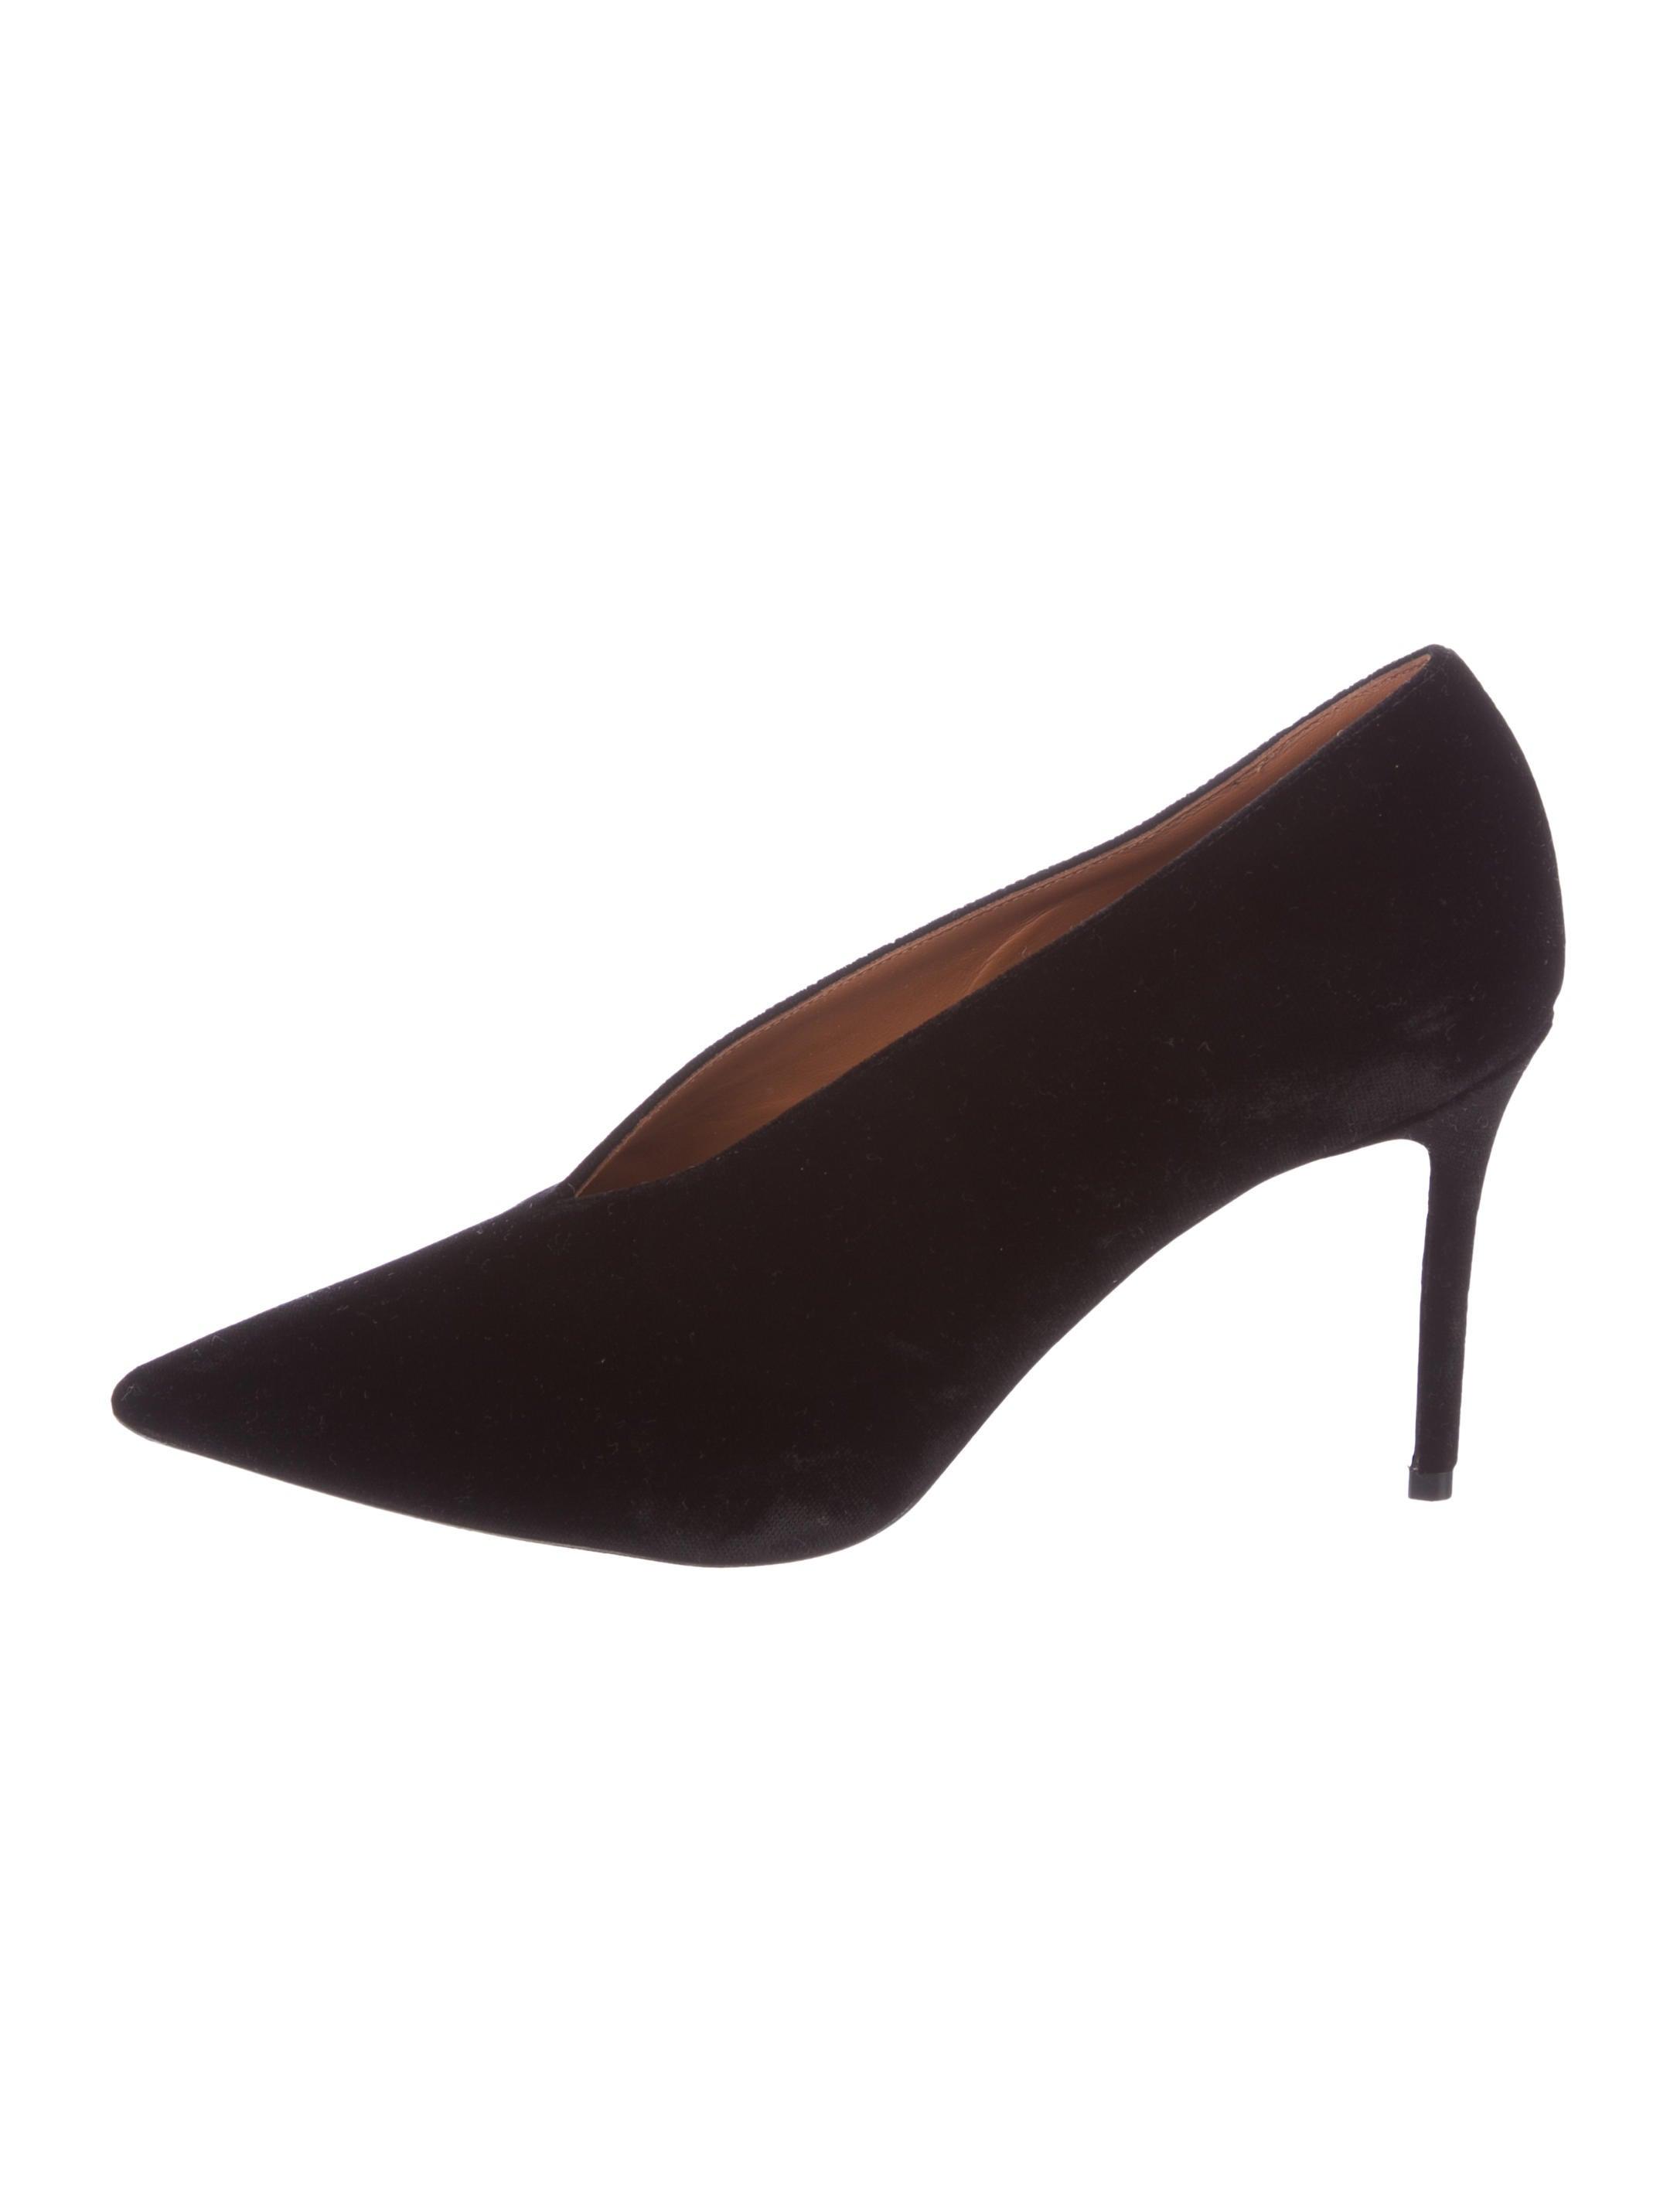 Céline Velvet Pointed-Toe Pumps free shipping ebay clearance finishline Y9aQJiaJx